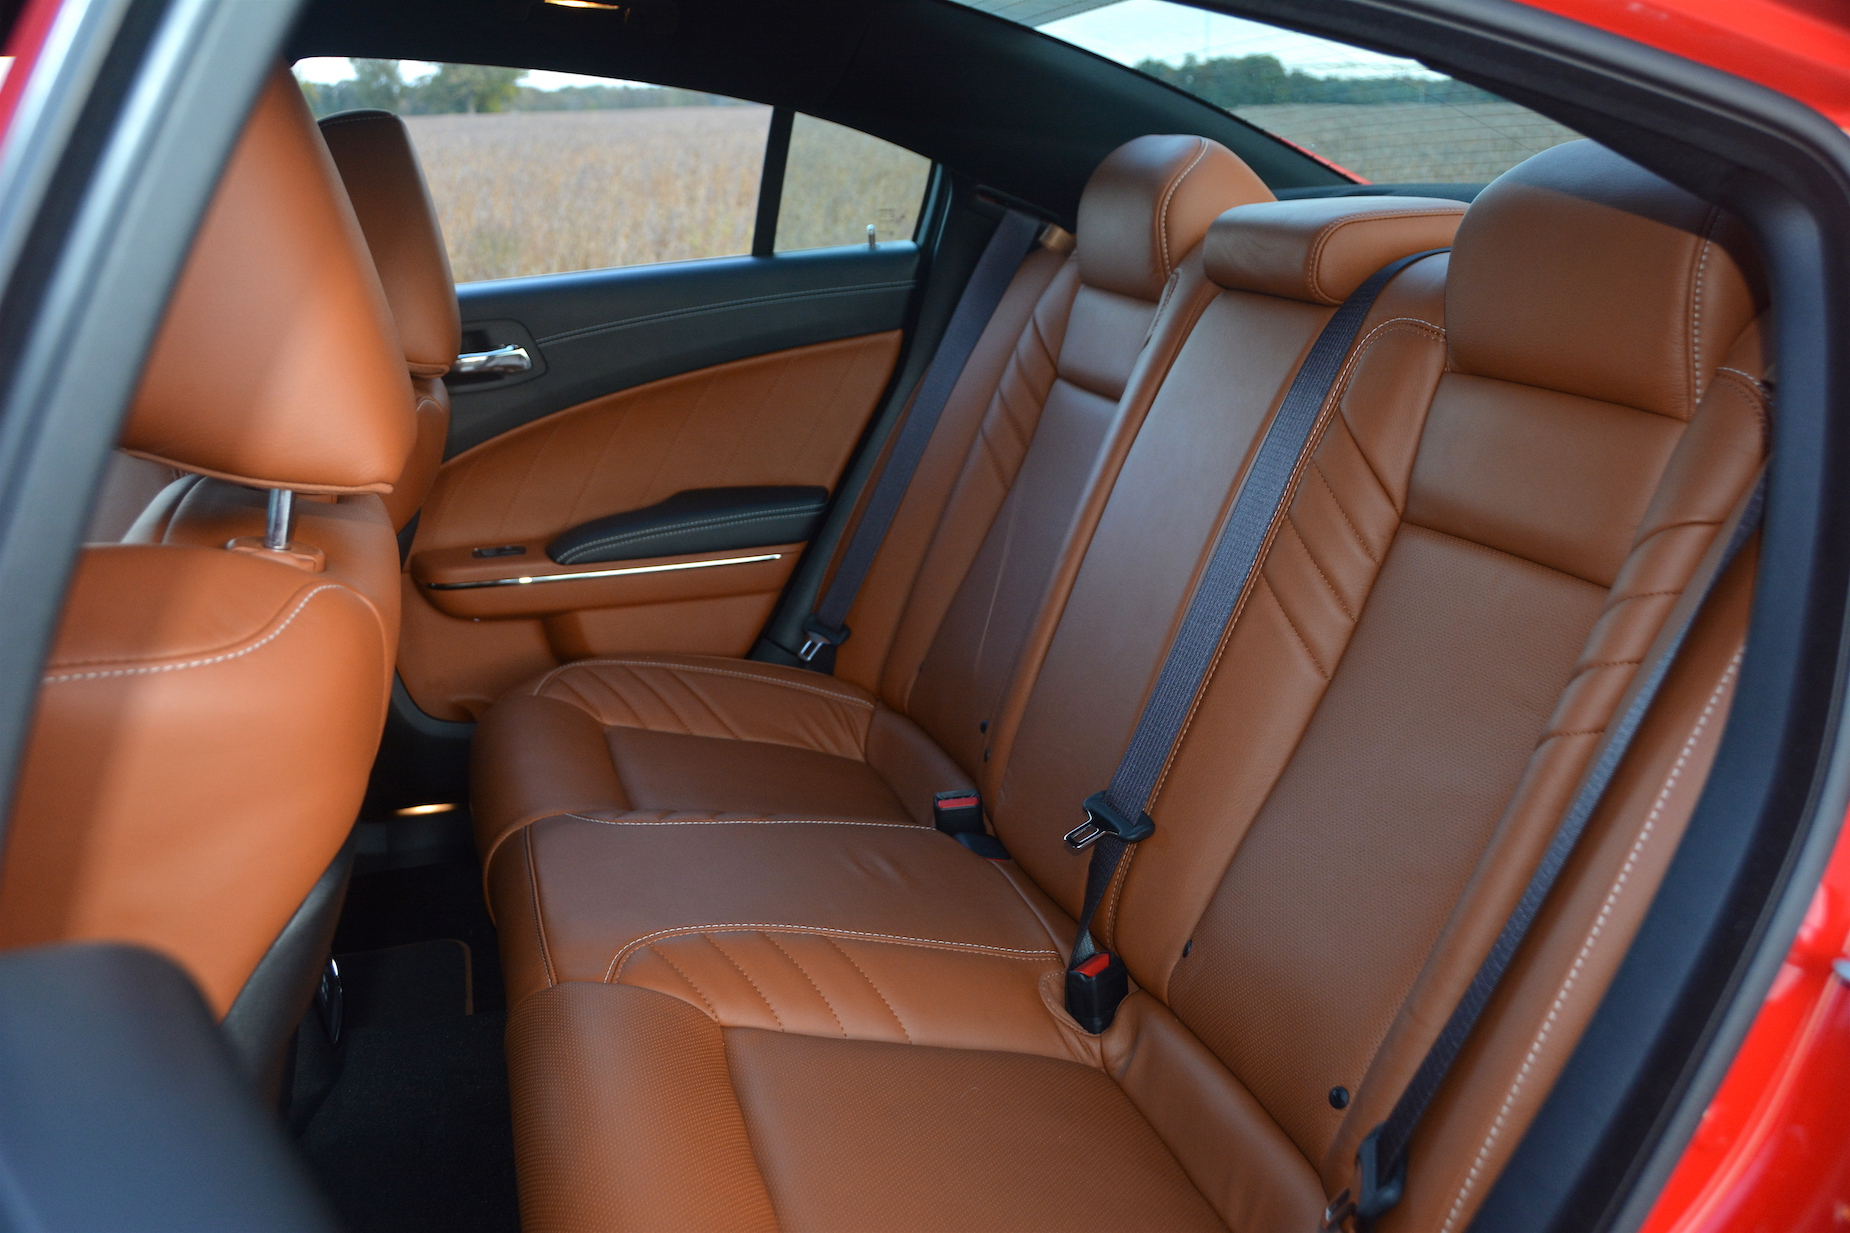 Dodge Charger SRT Hellcat Widebody Rear Seats